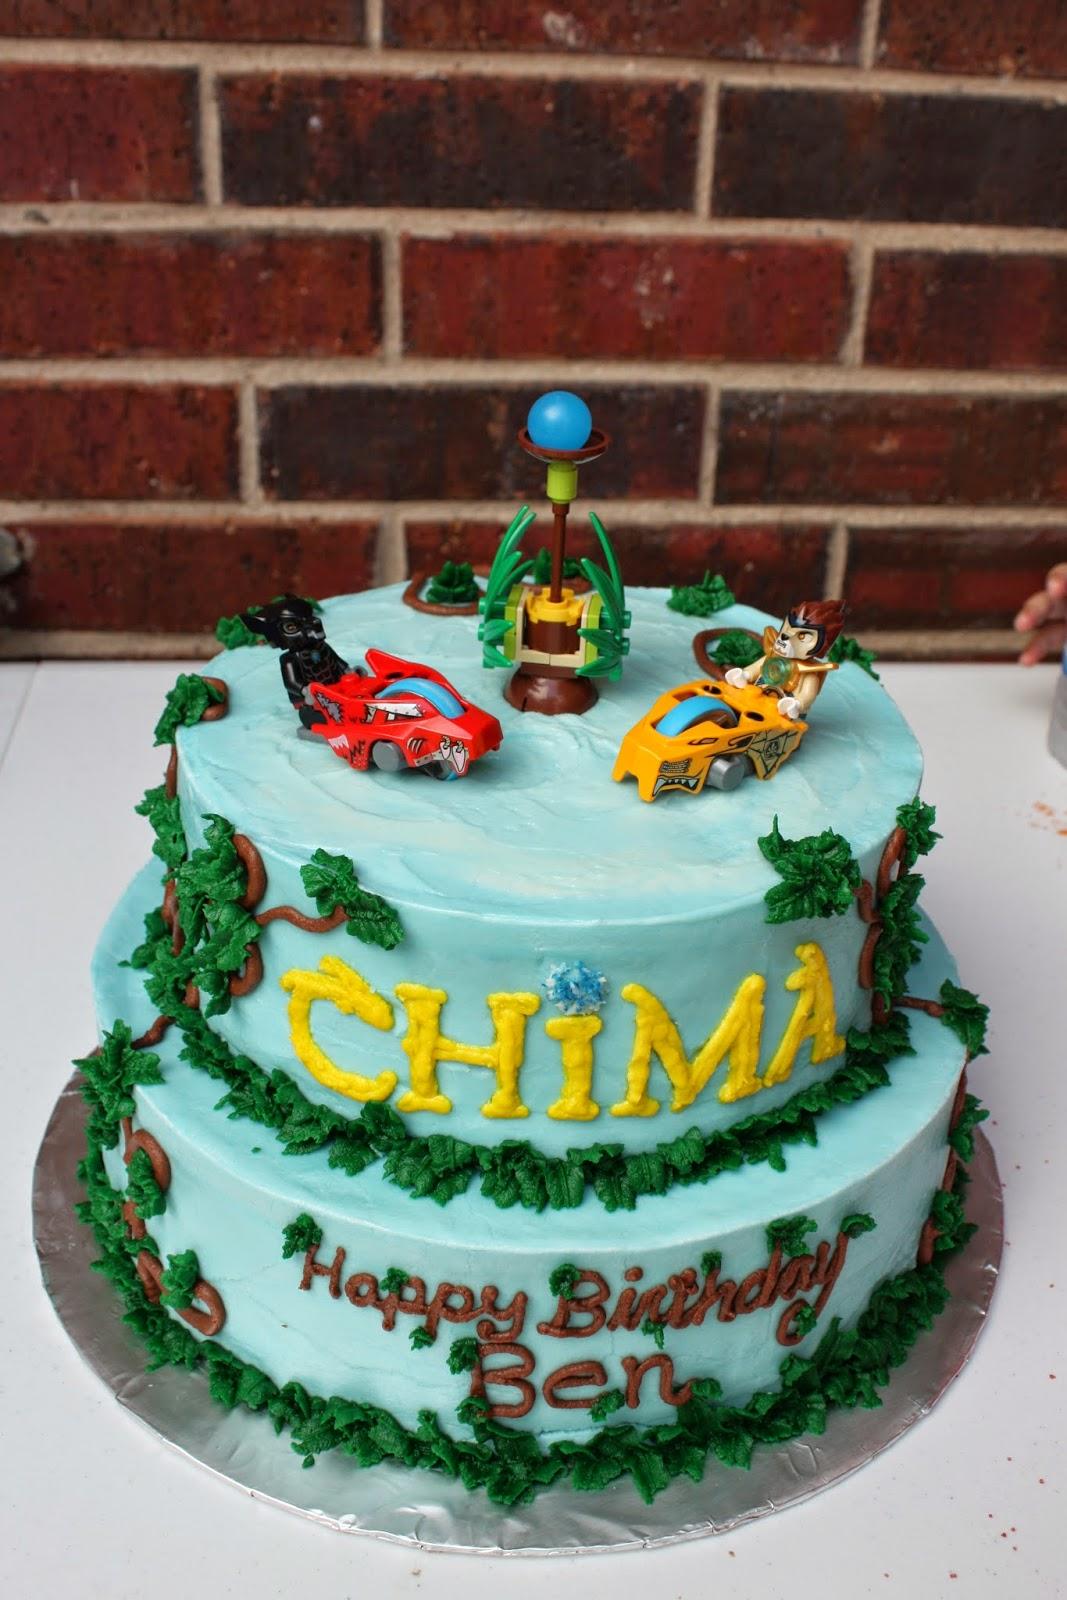 Uncategorized legends of chima birthday supplies myideasbedroom com